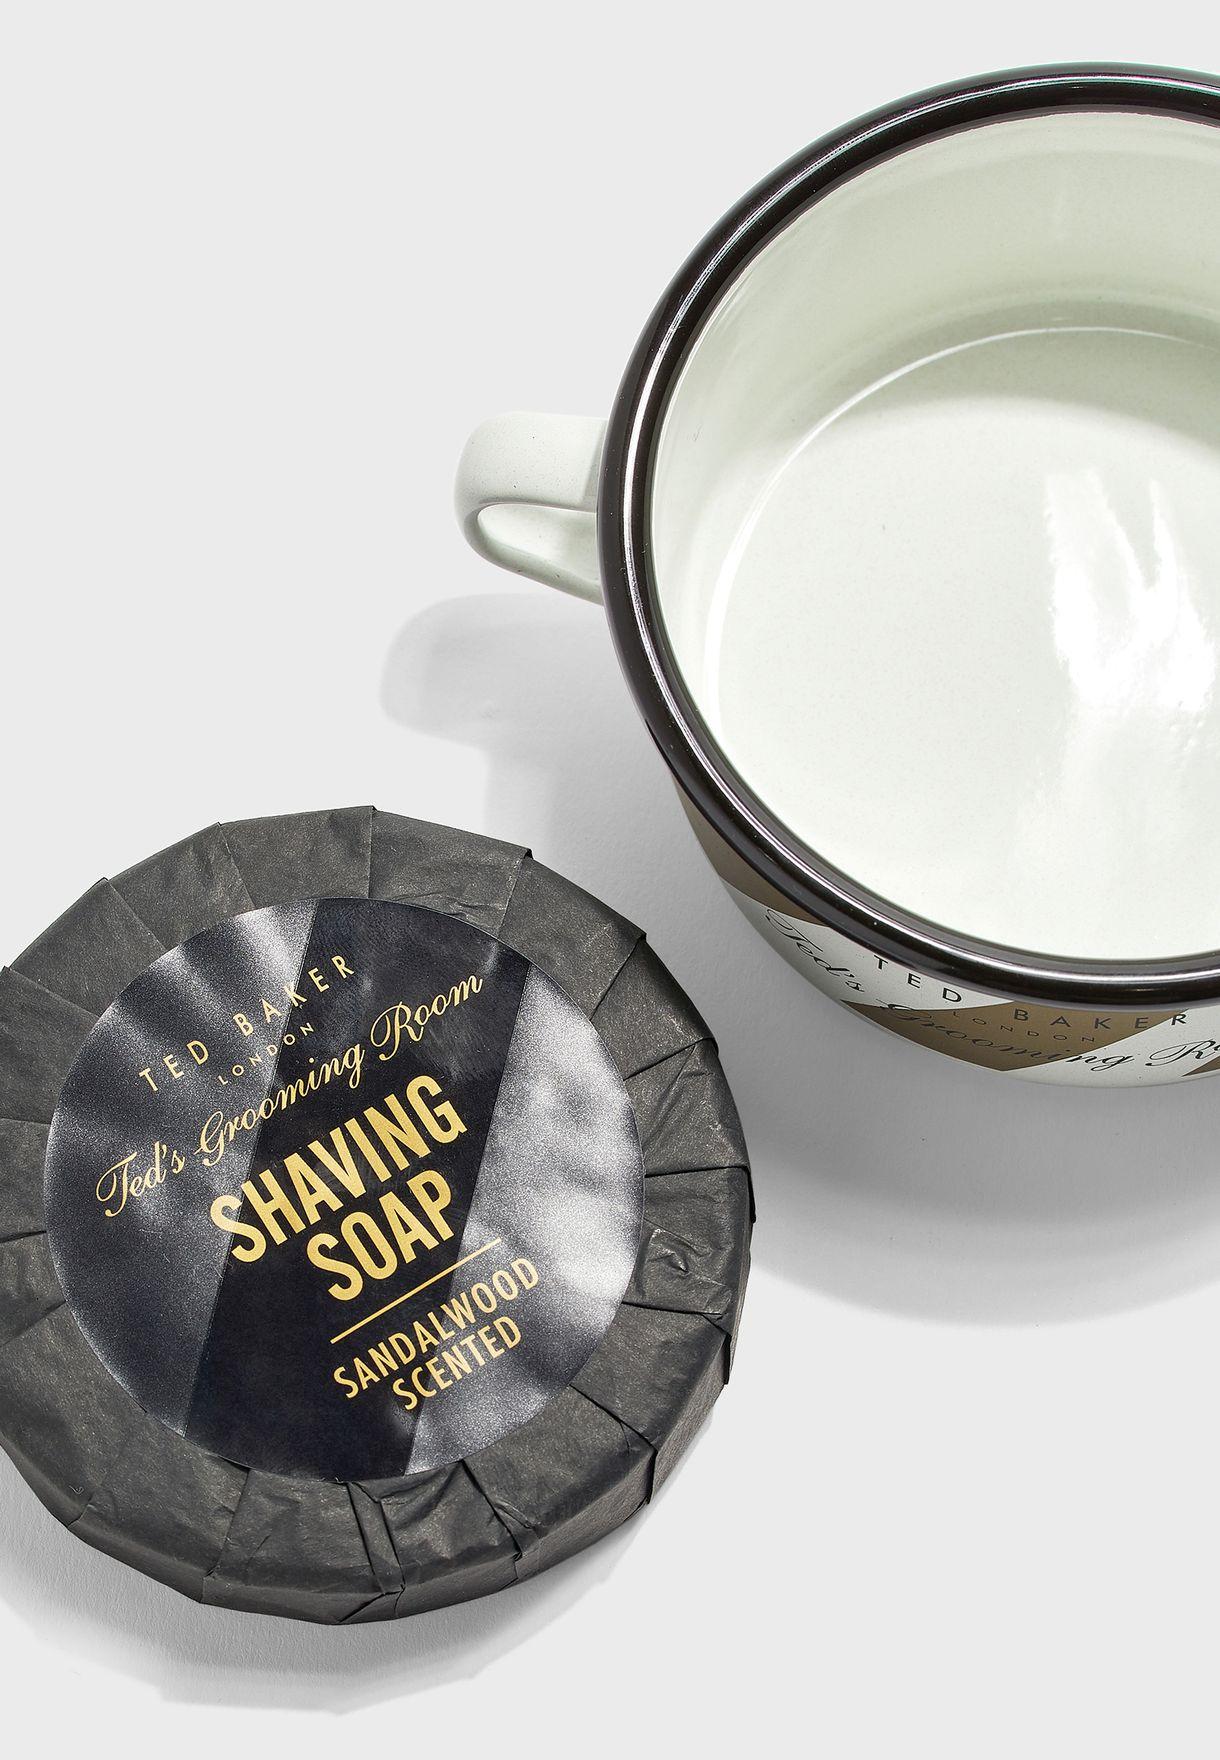 Enamel Shaving Bowl & Soap